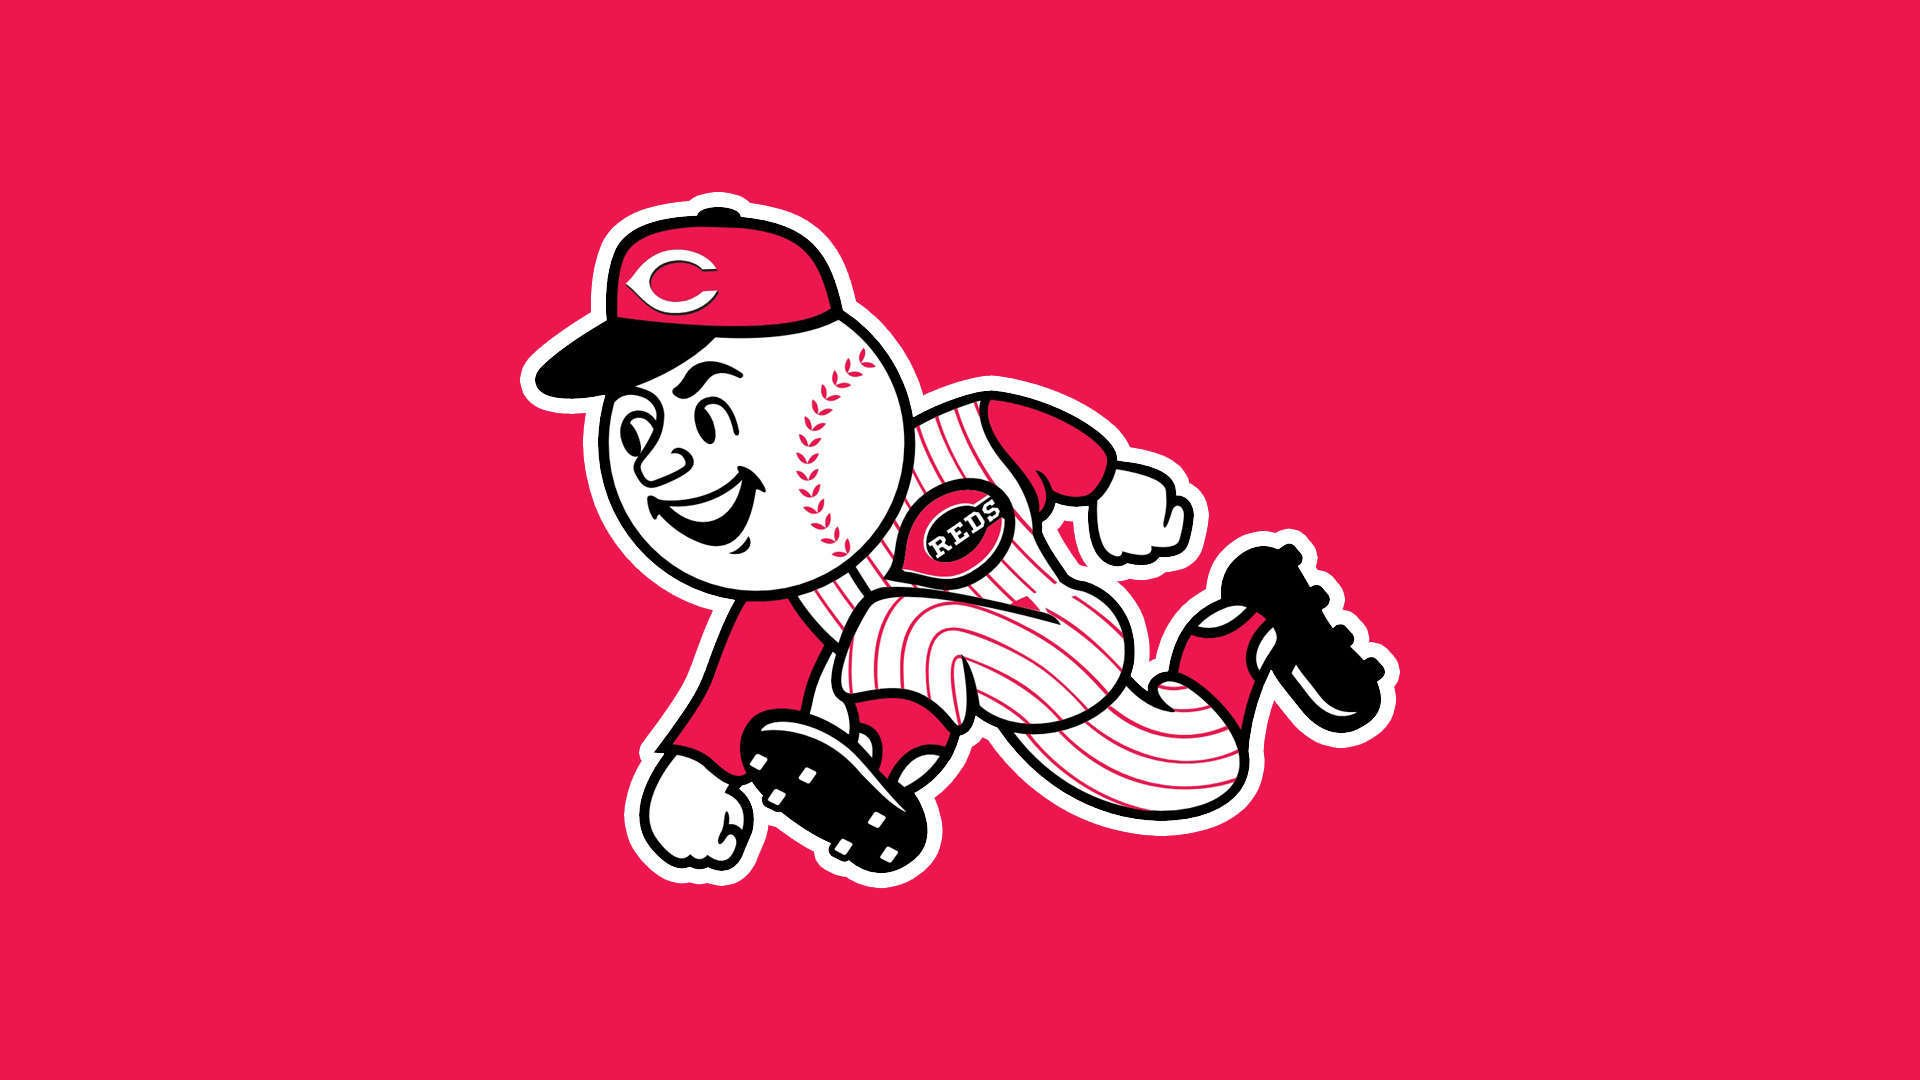 Download now Cincinnati Reds Logo HD Wallpaper Read description info 1920x1080